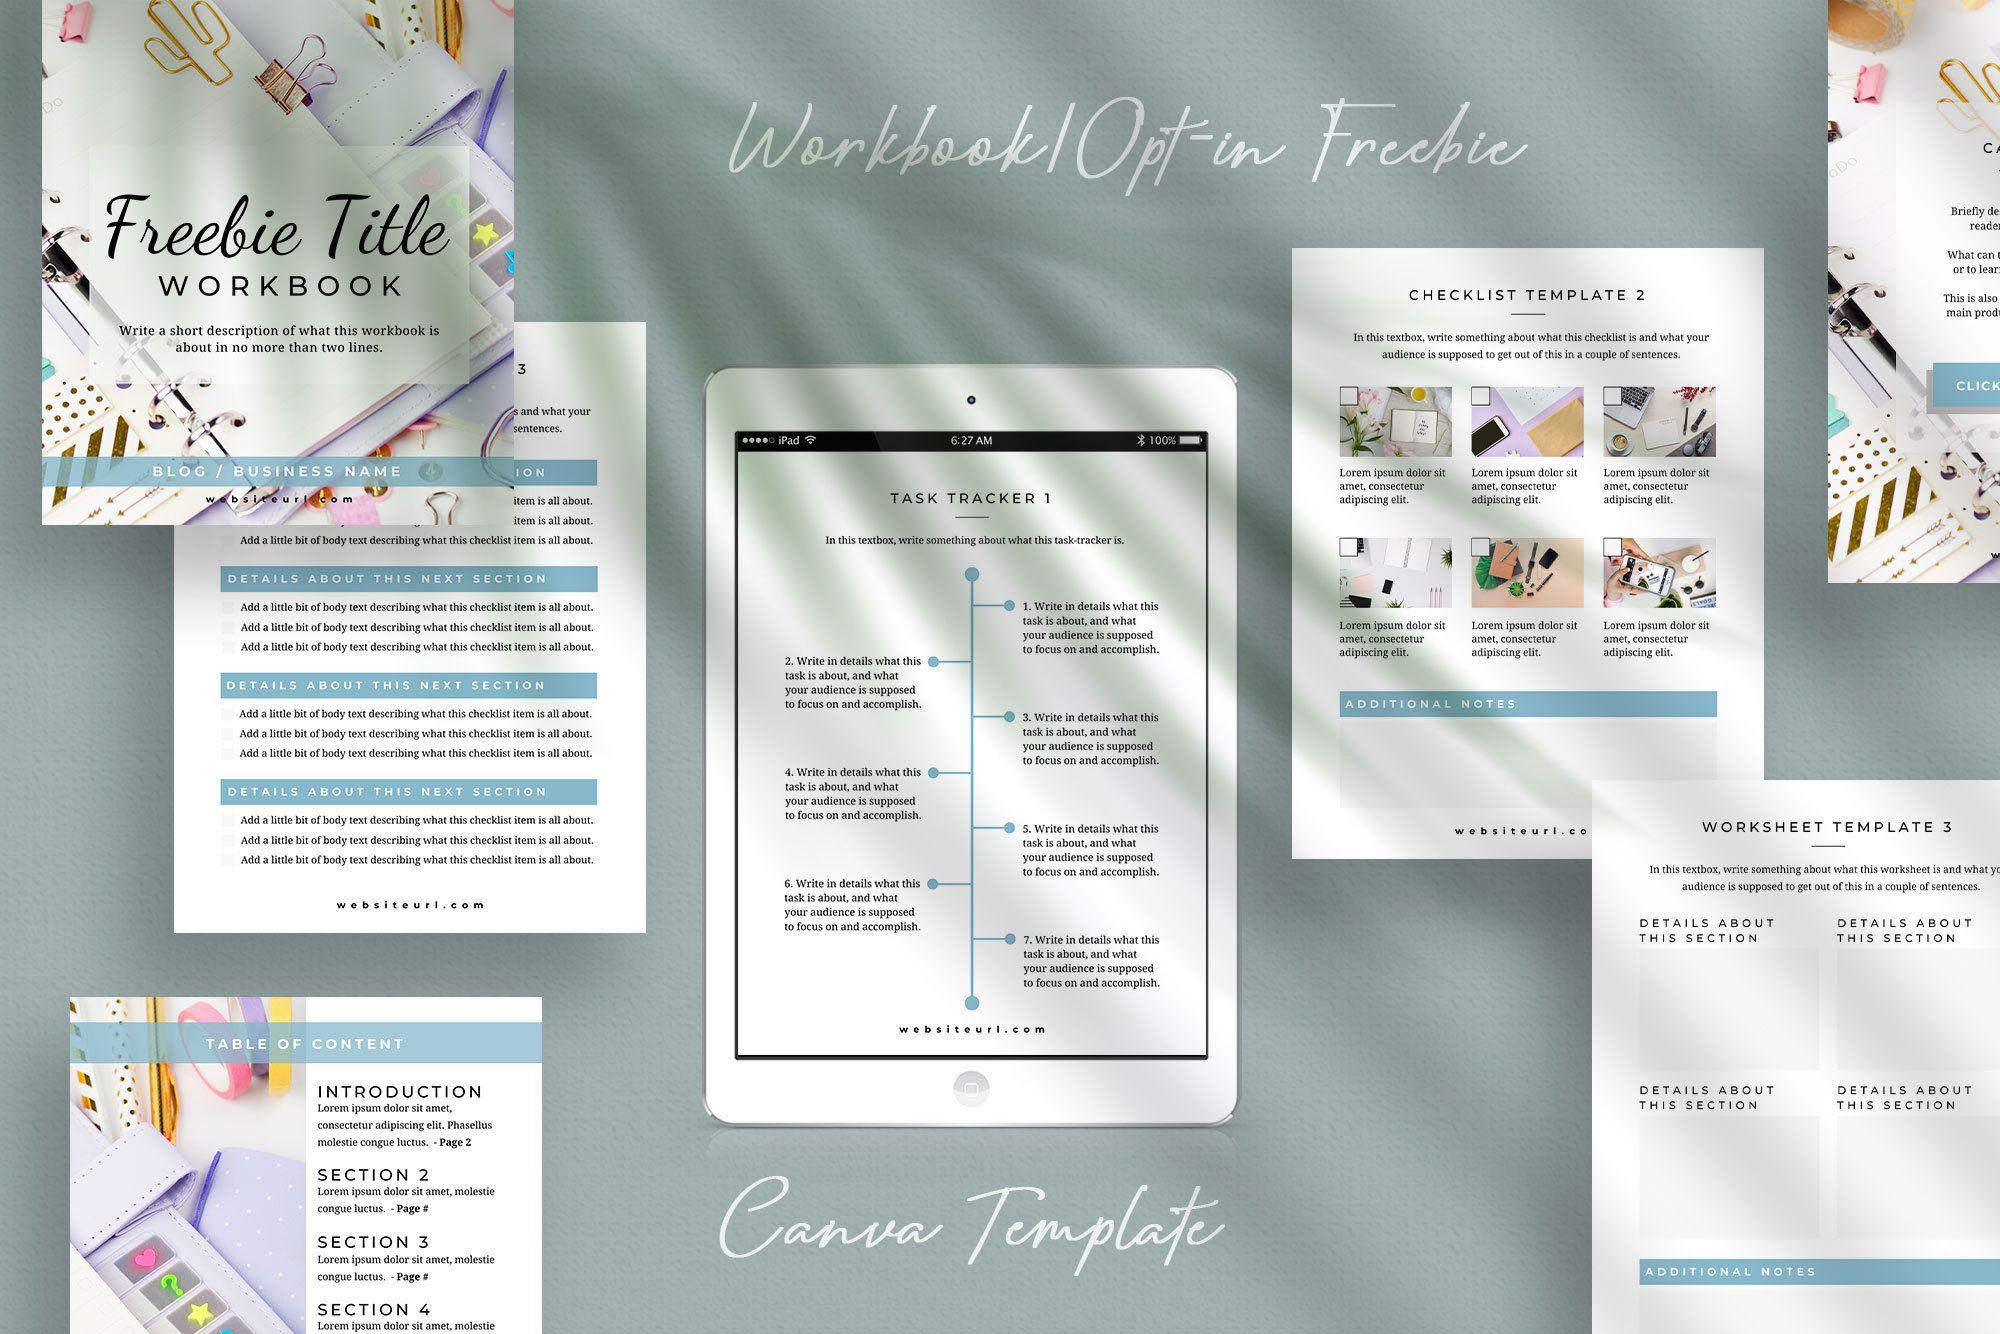 COLFAX Workbook Template, Workbook Canva Template